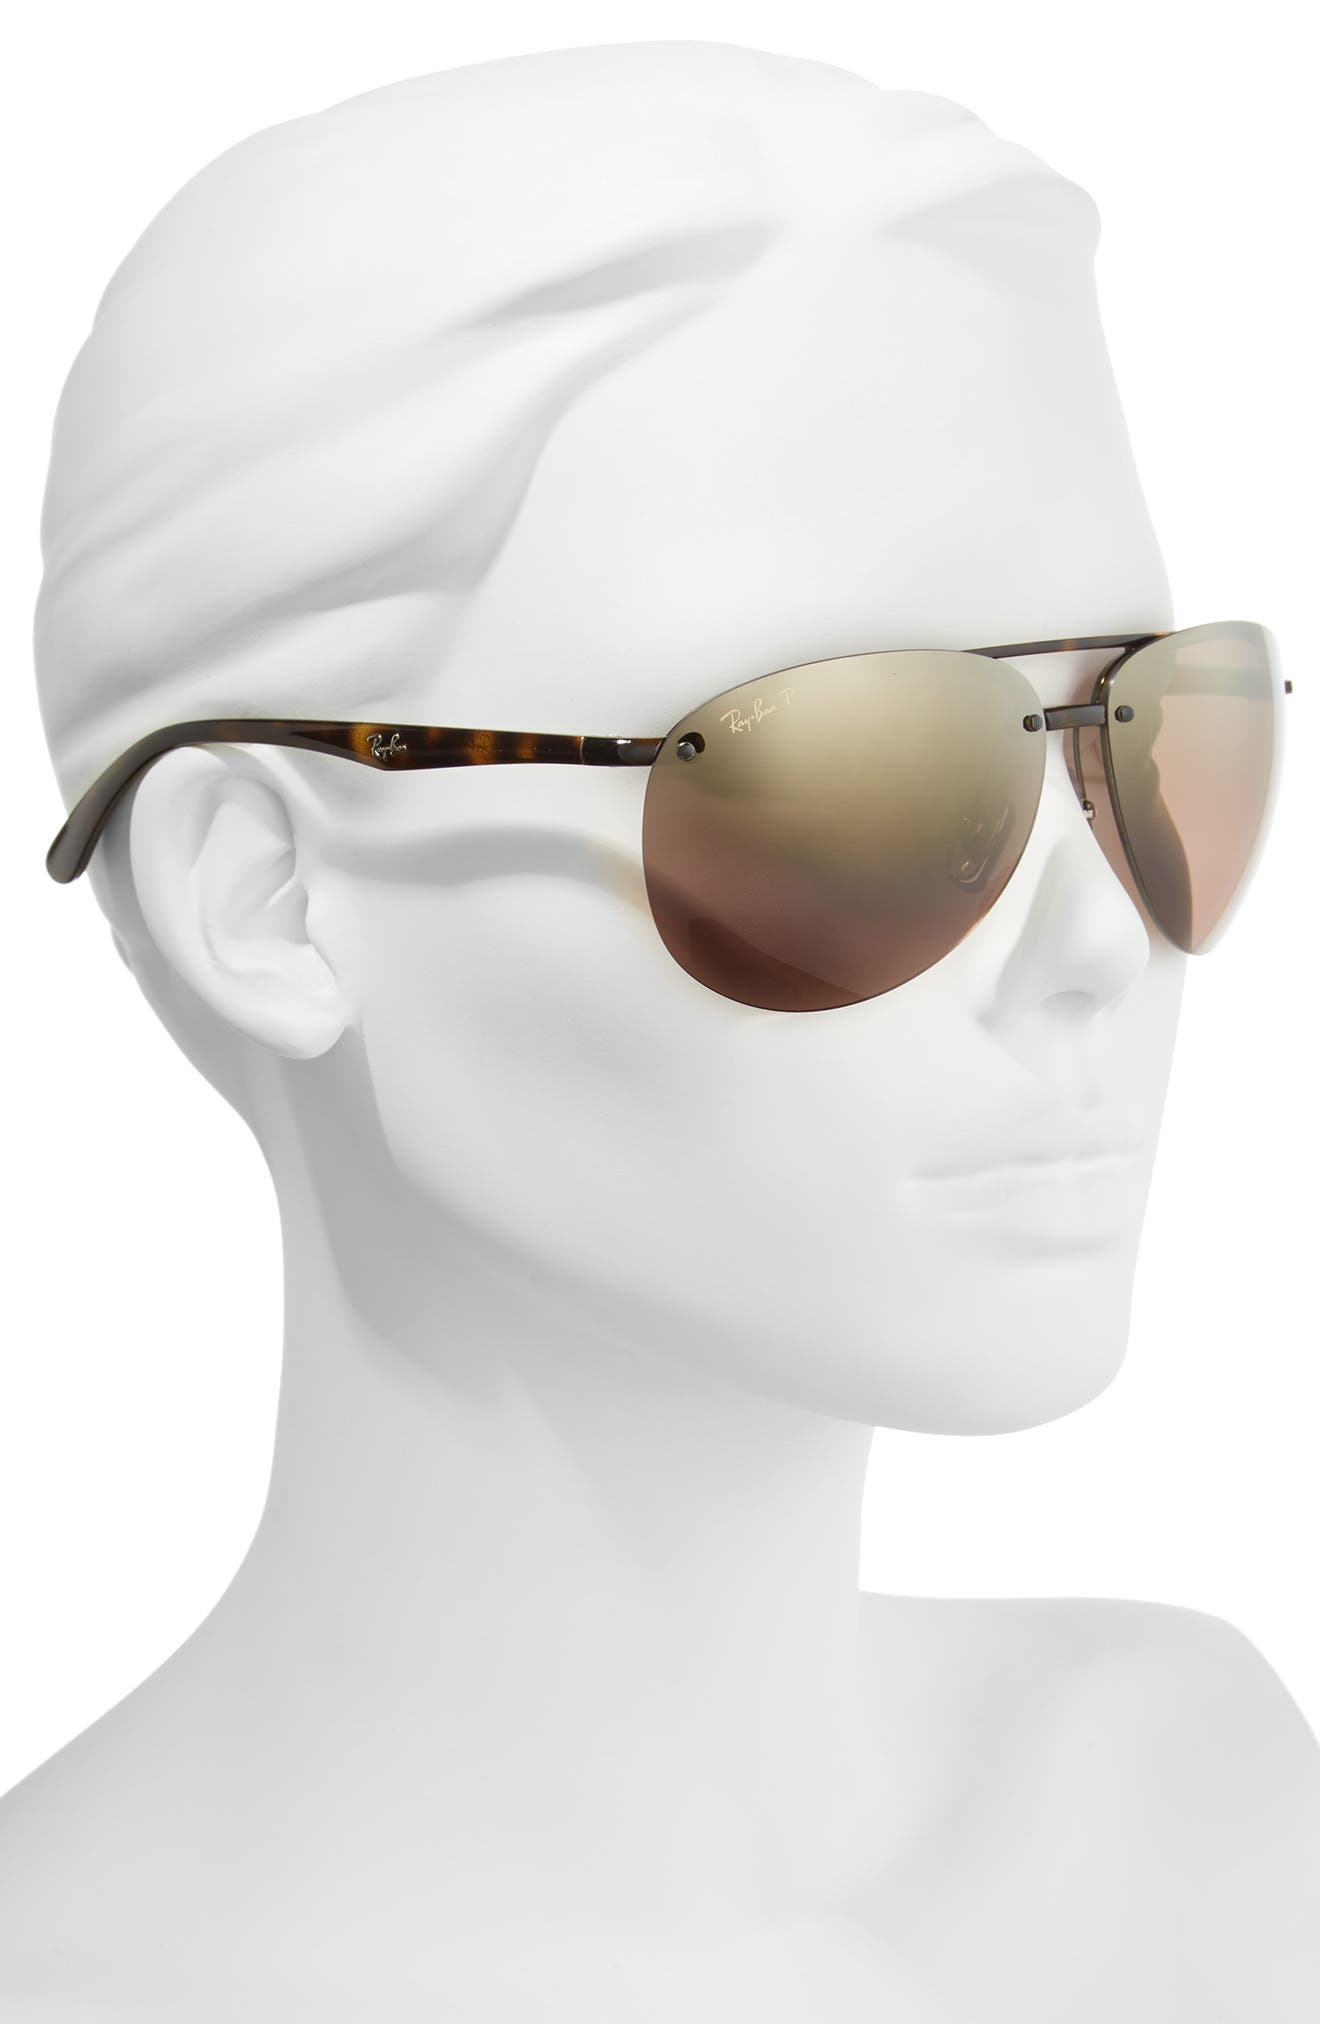 65mm Gradient Aviator Sunglasses,                             Alternate thumbnail 2, color,                             200